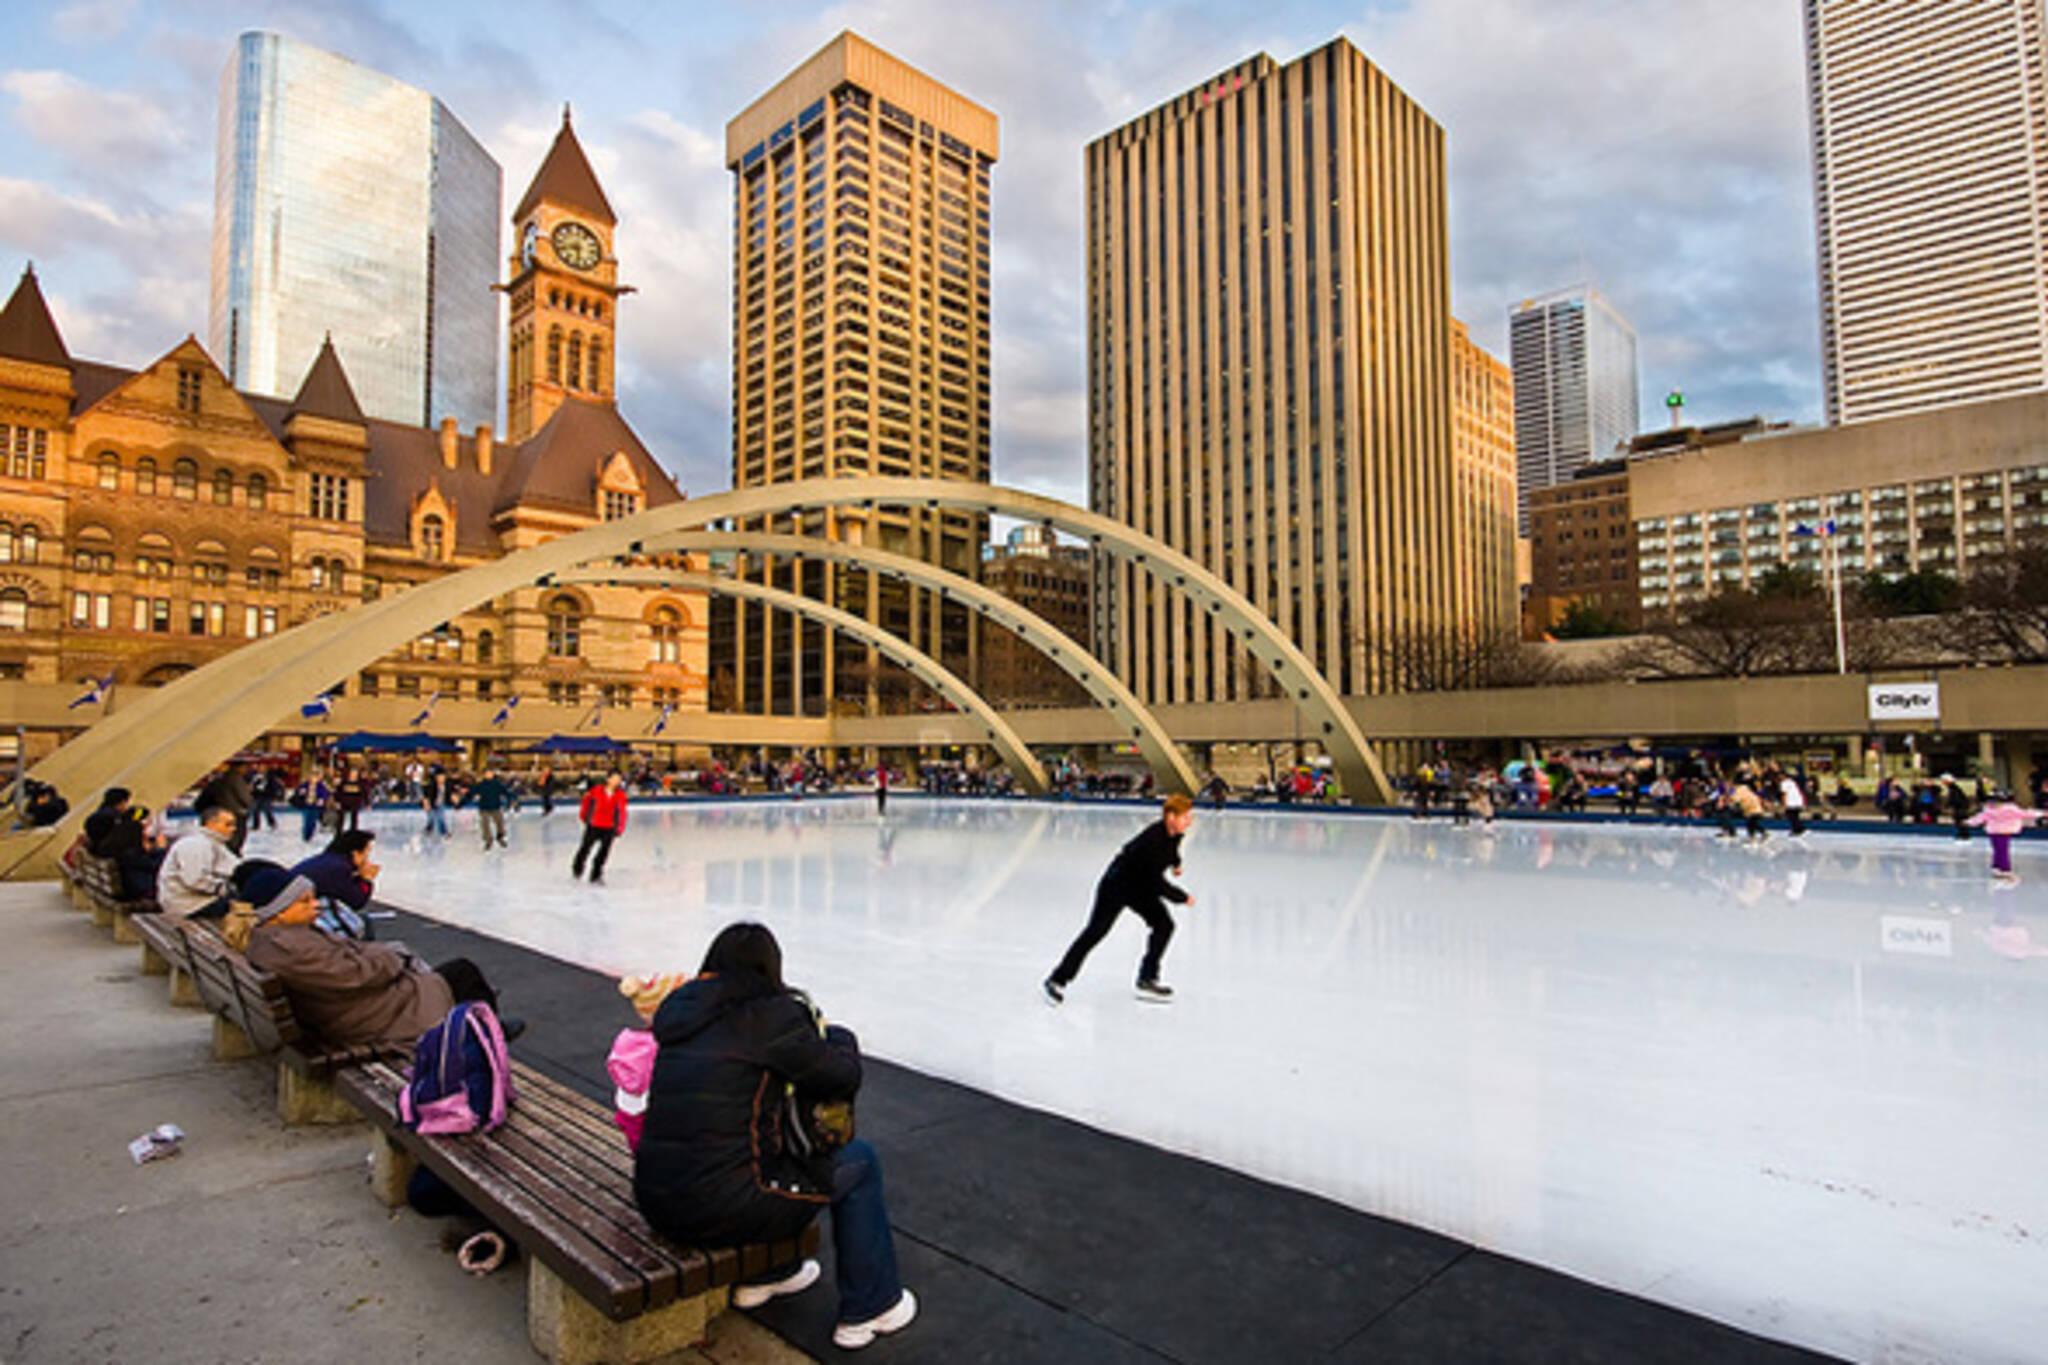 Roller skating rink etobicoke - Toronto Skating Rinks